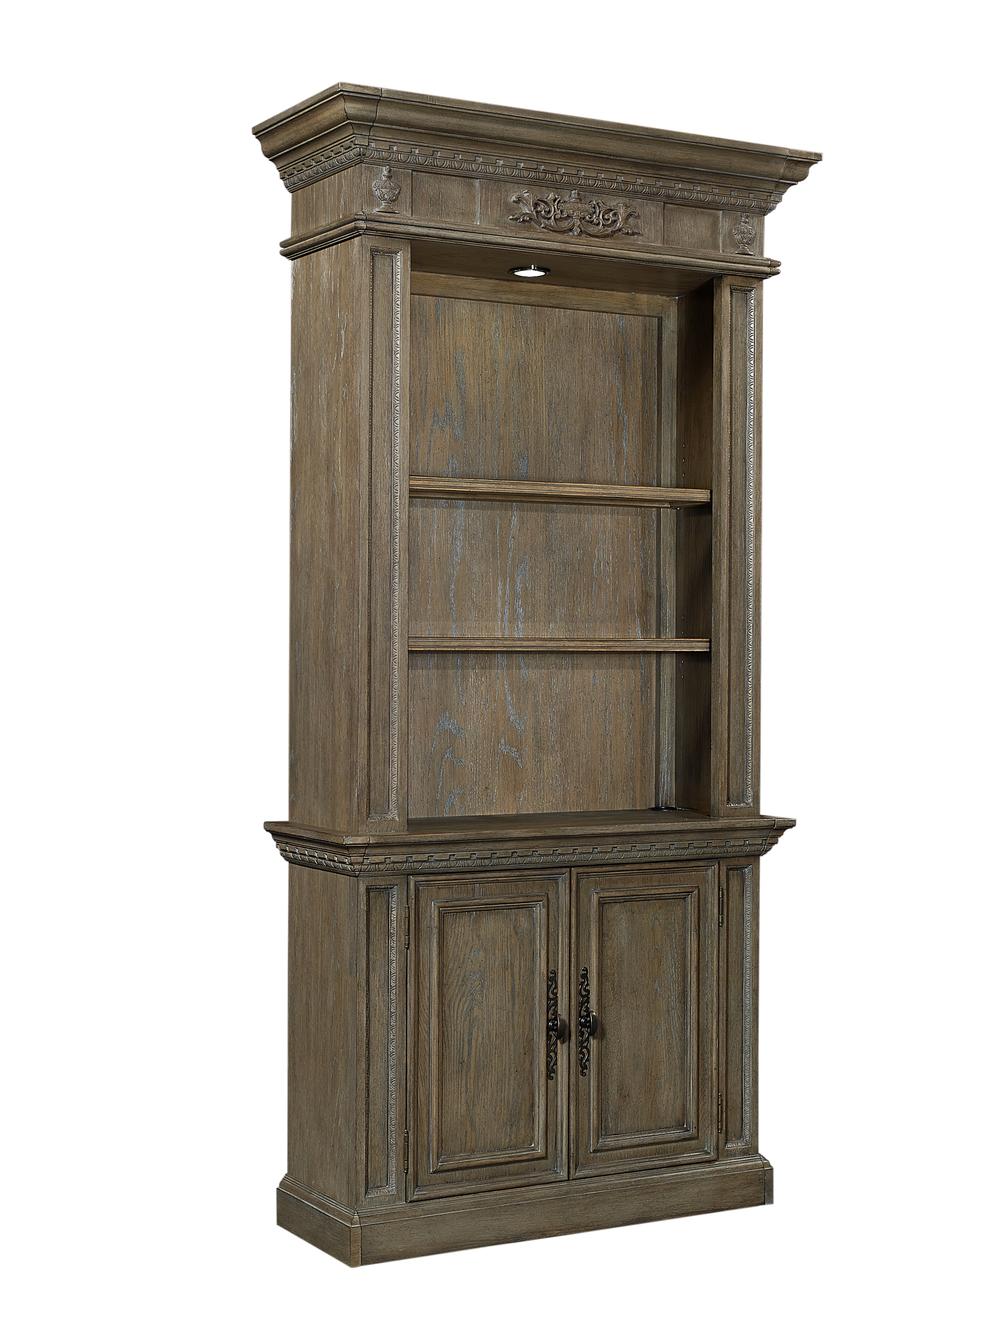 Aspenhome - Belle Maison Door Bookcase